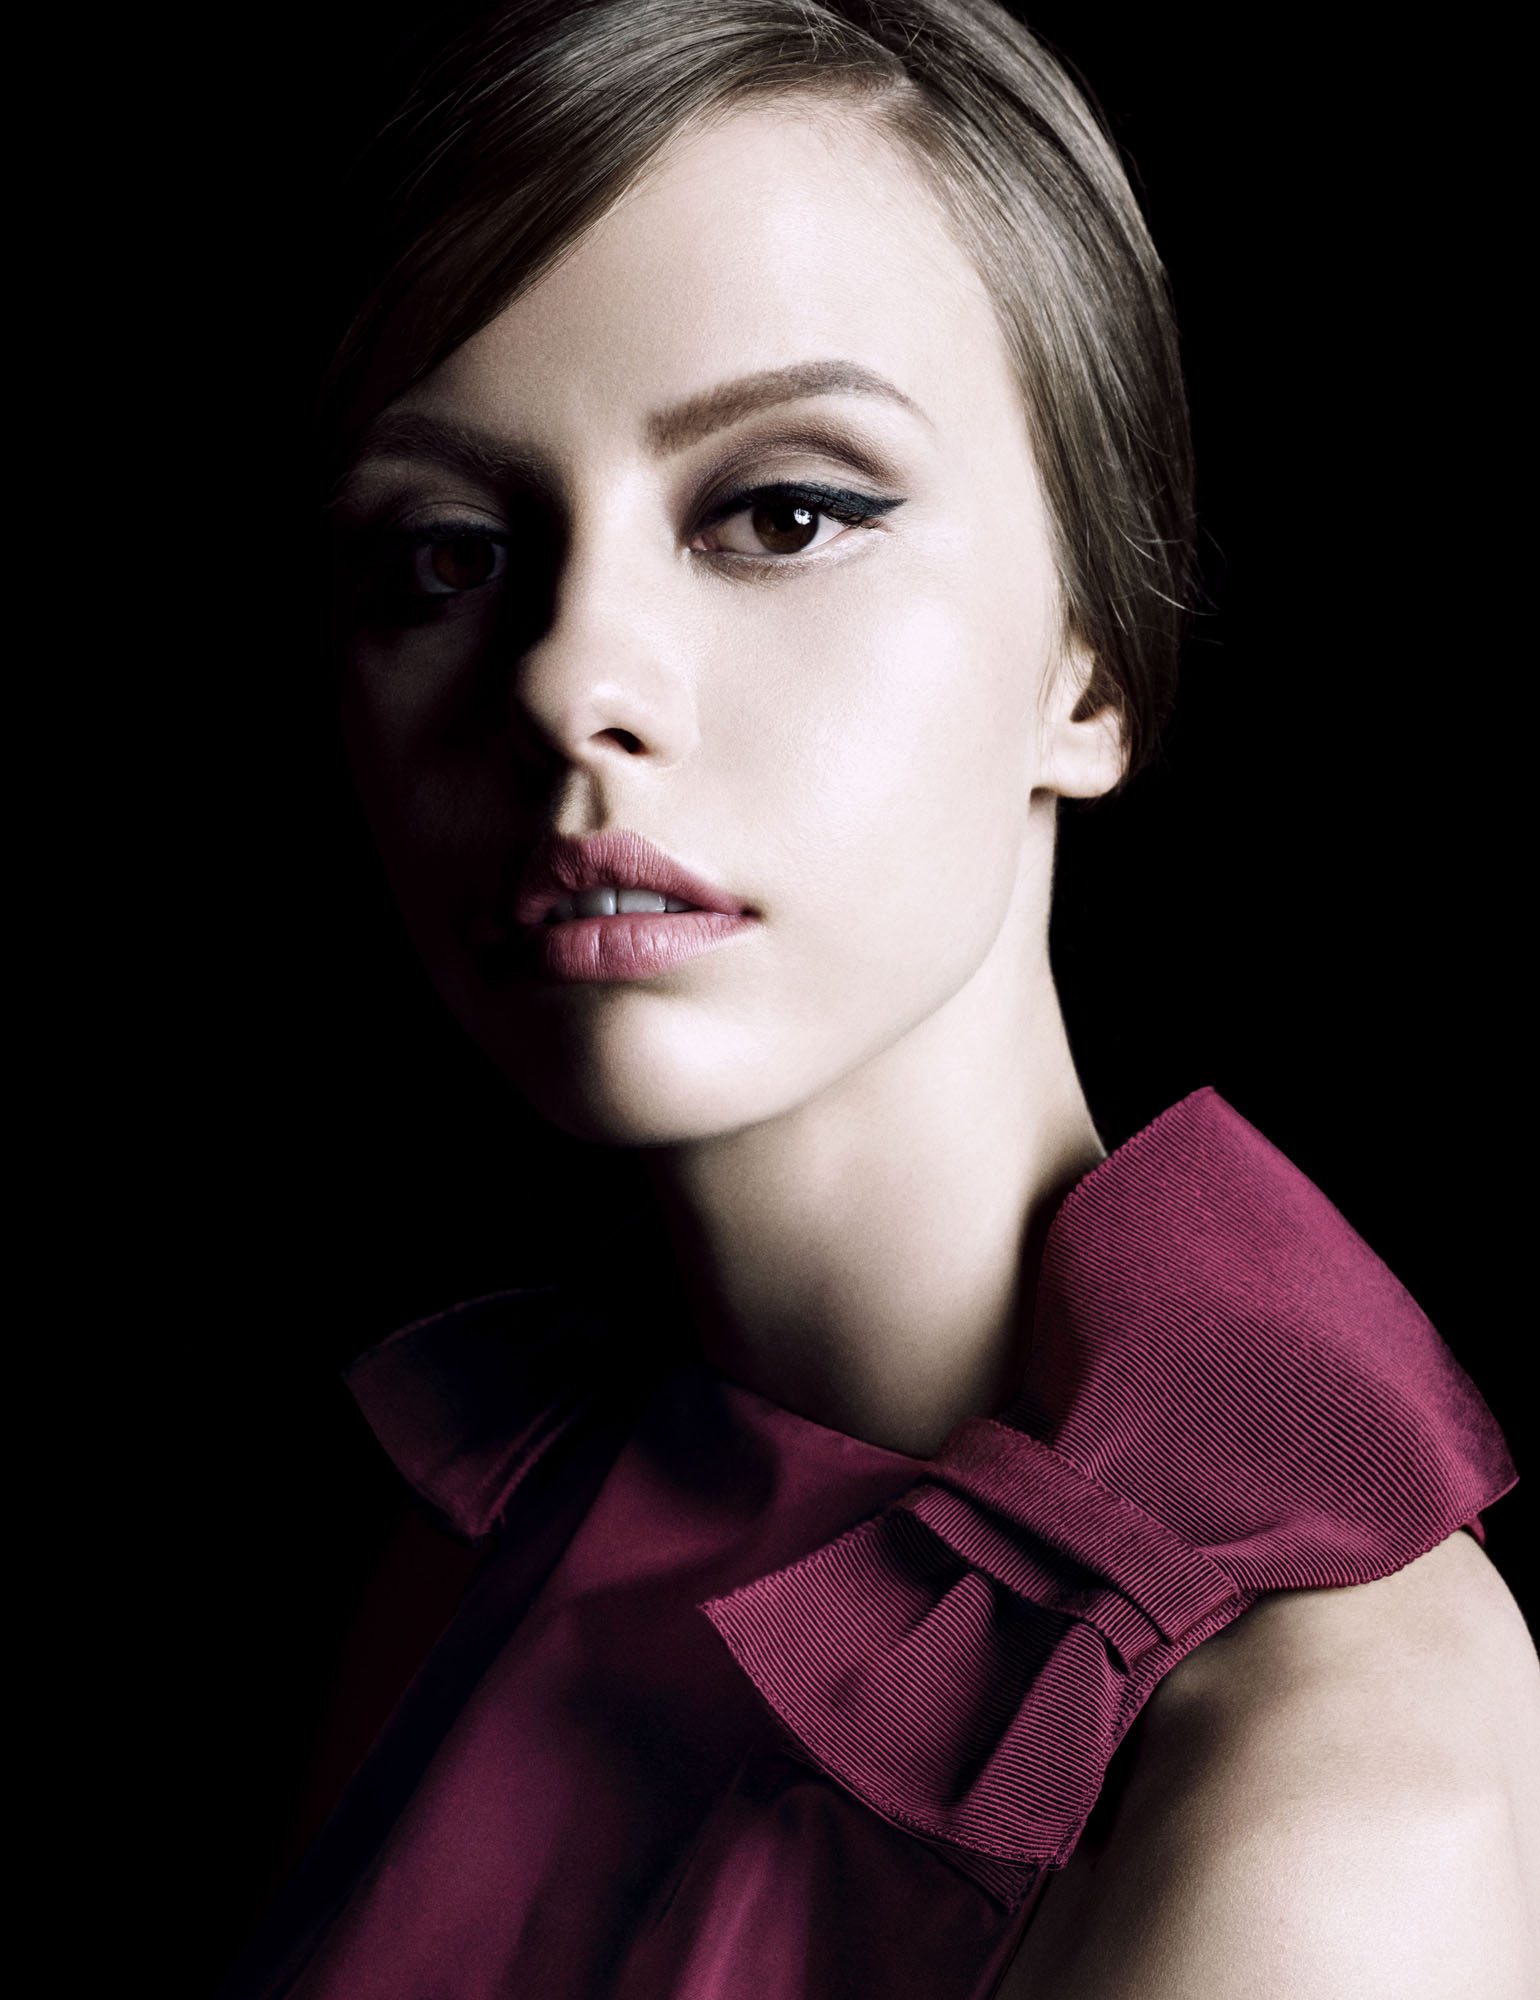 Prada la femme intense prada perfume a novo fragr ncia feminino 2017 - La femme a la bouche fendue ...